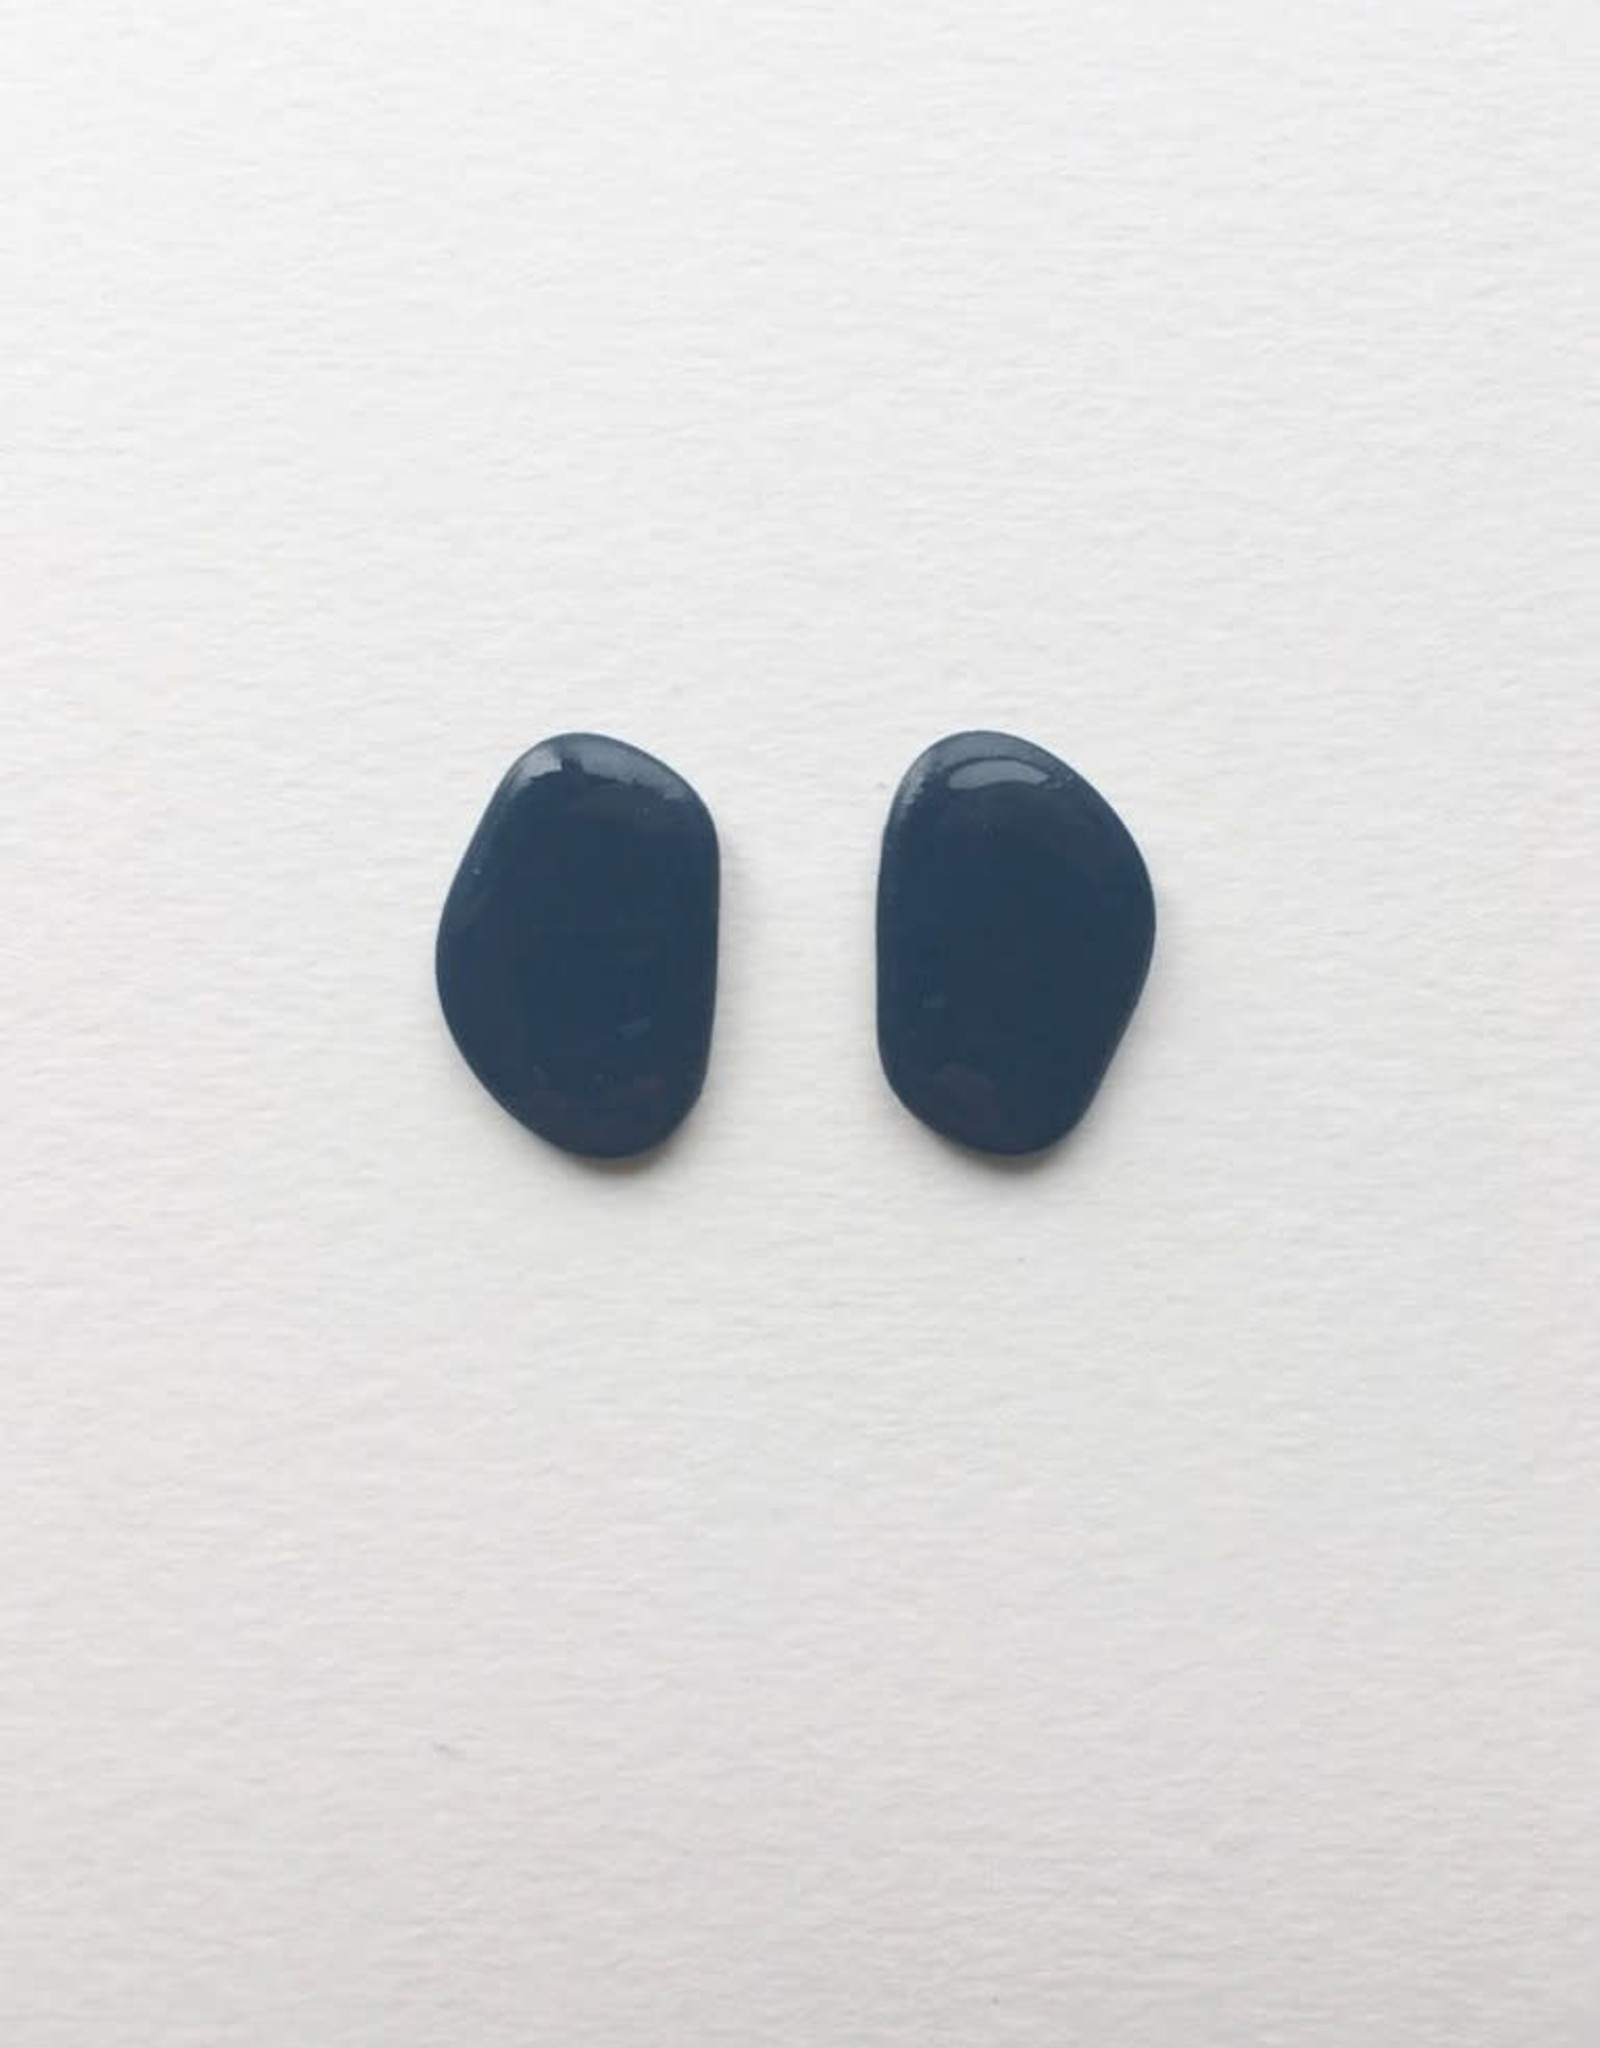 CartoucheMTL Boucles d'oreilles Inès CartoucheMTL Bleu foncé